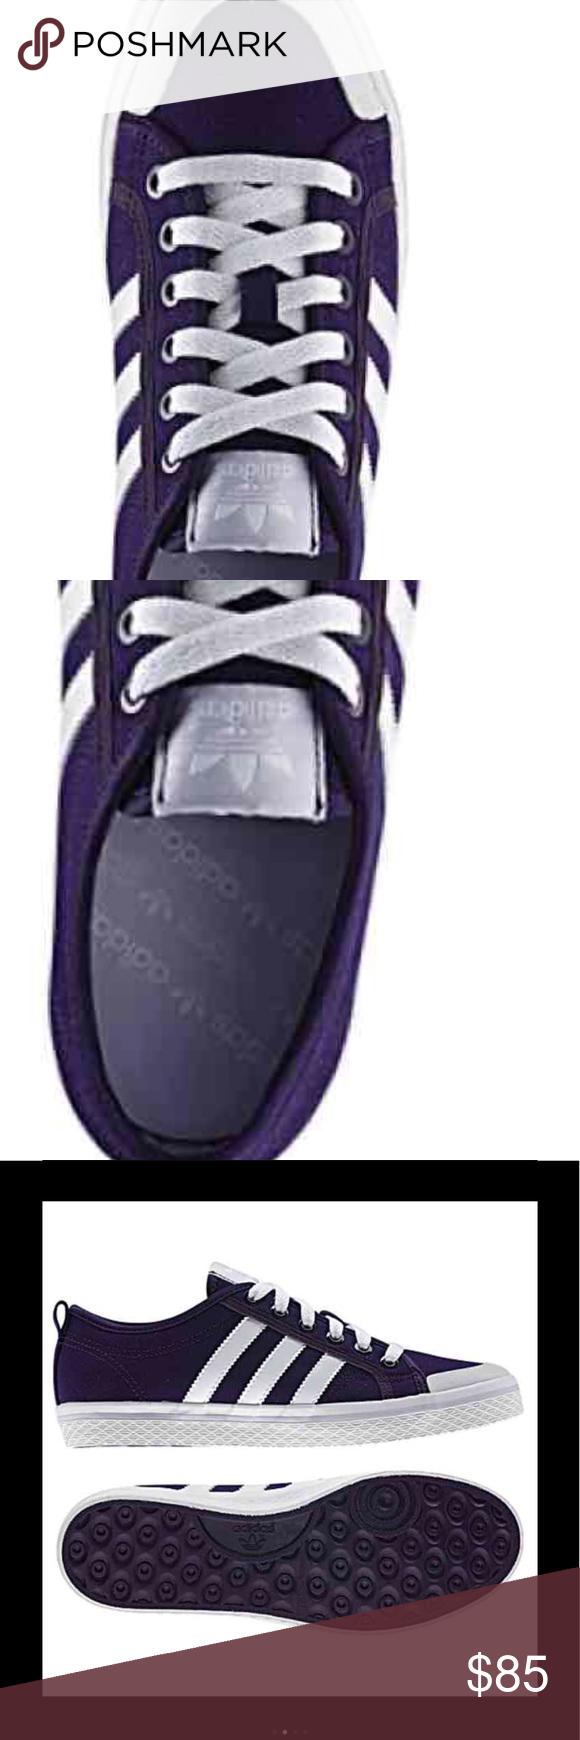 Adidas Adidas Originals Superstar slip on sneakers $95